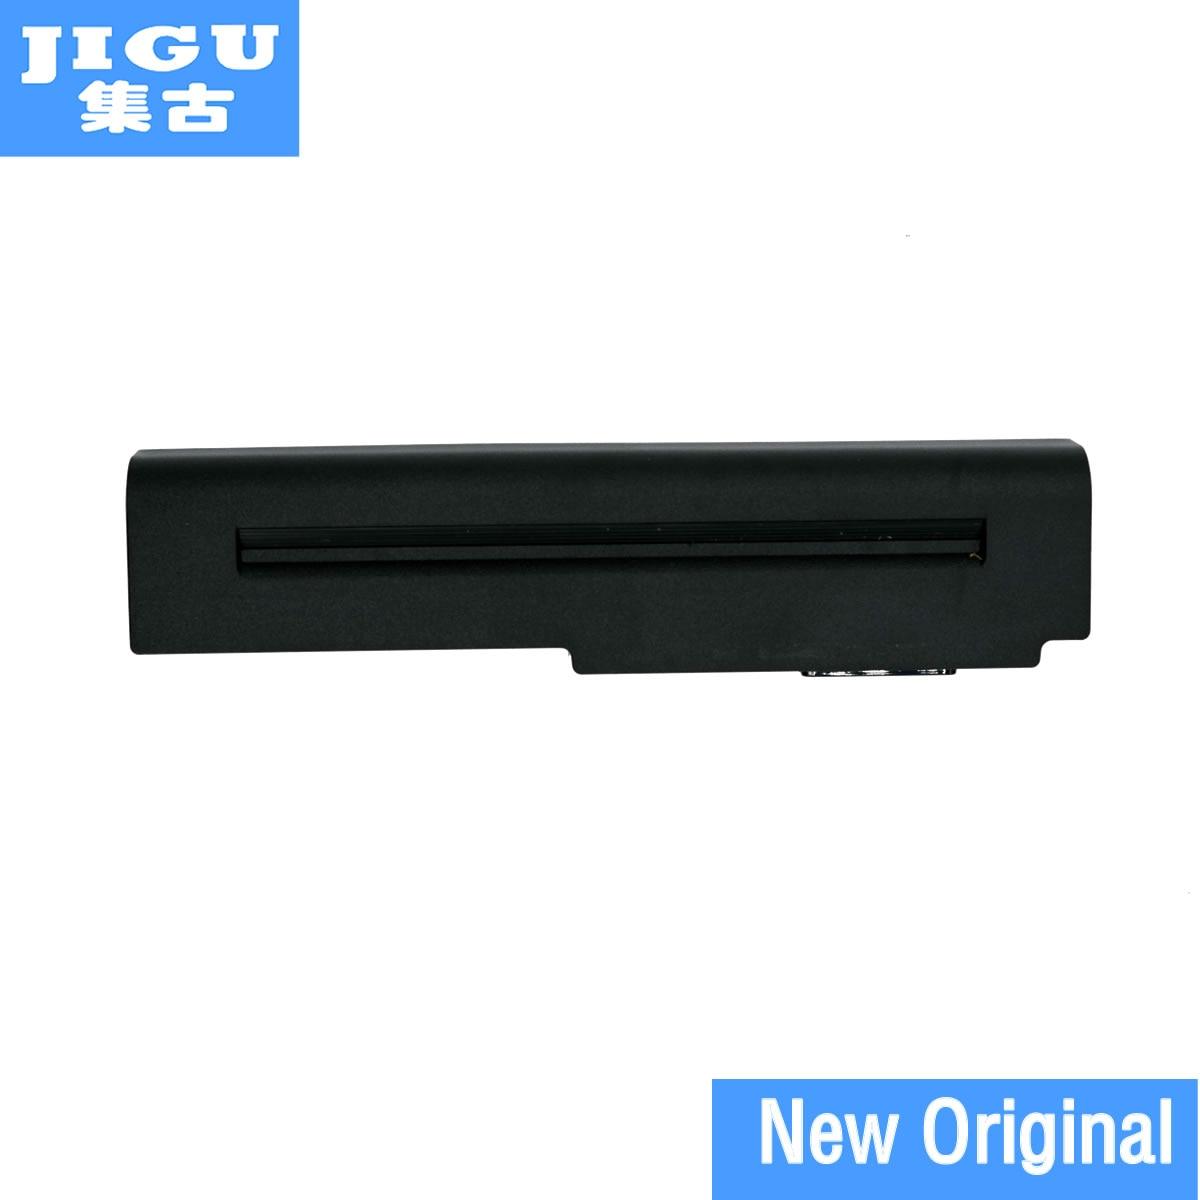 JIGU Original laptop Battery For N53 A32-M50 M50s N53SV N53T N53TA N53TK N53V N53X N53XI A32-M50 A32-N61 A32-X64 A33-M50 аккумулятор для ноутбука oem 5200mah asus n61 n61j n61d n61v n61vg n61ja n61jv n53 a32 m50 m50s n53s n53sv a32 m50 a32 n61 a32 x 64 33 m50 n53s n53 a32 m50 m50s n53s n53sv a32 m50